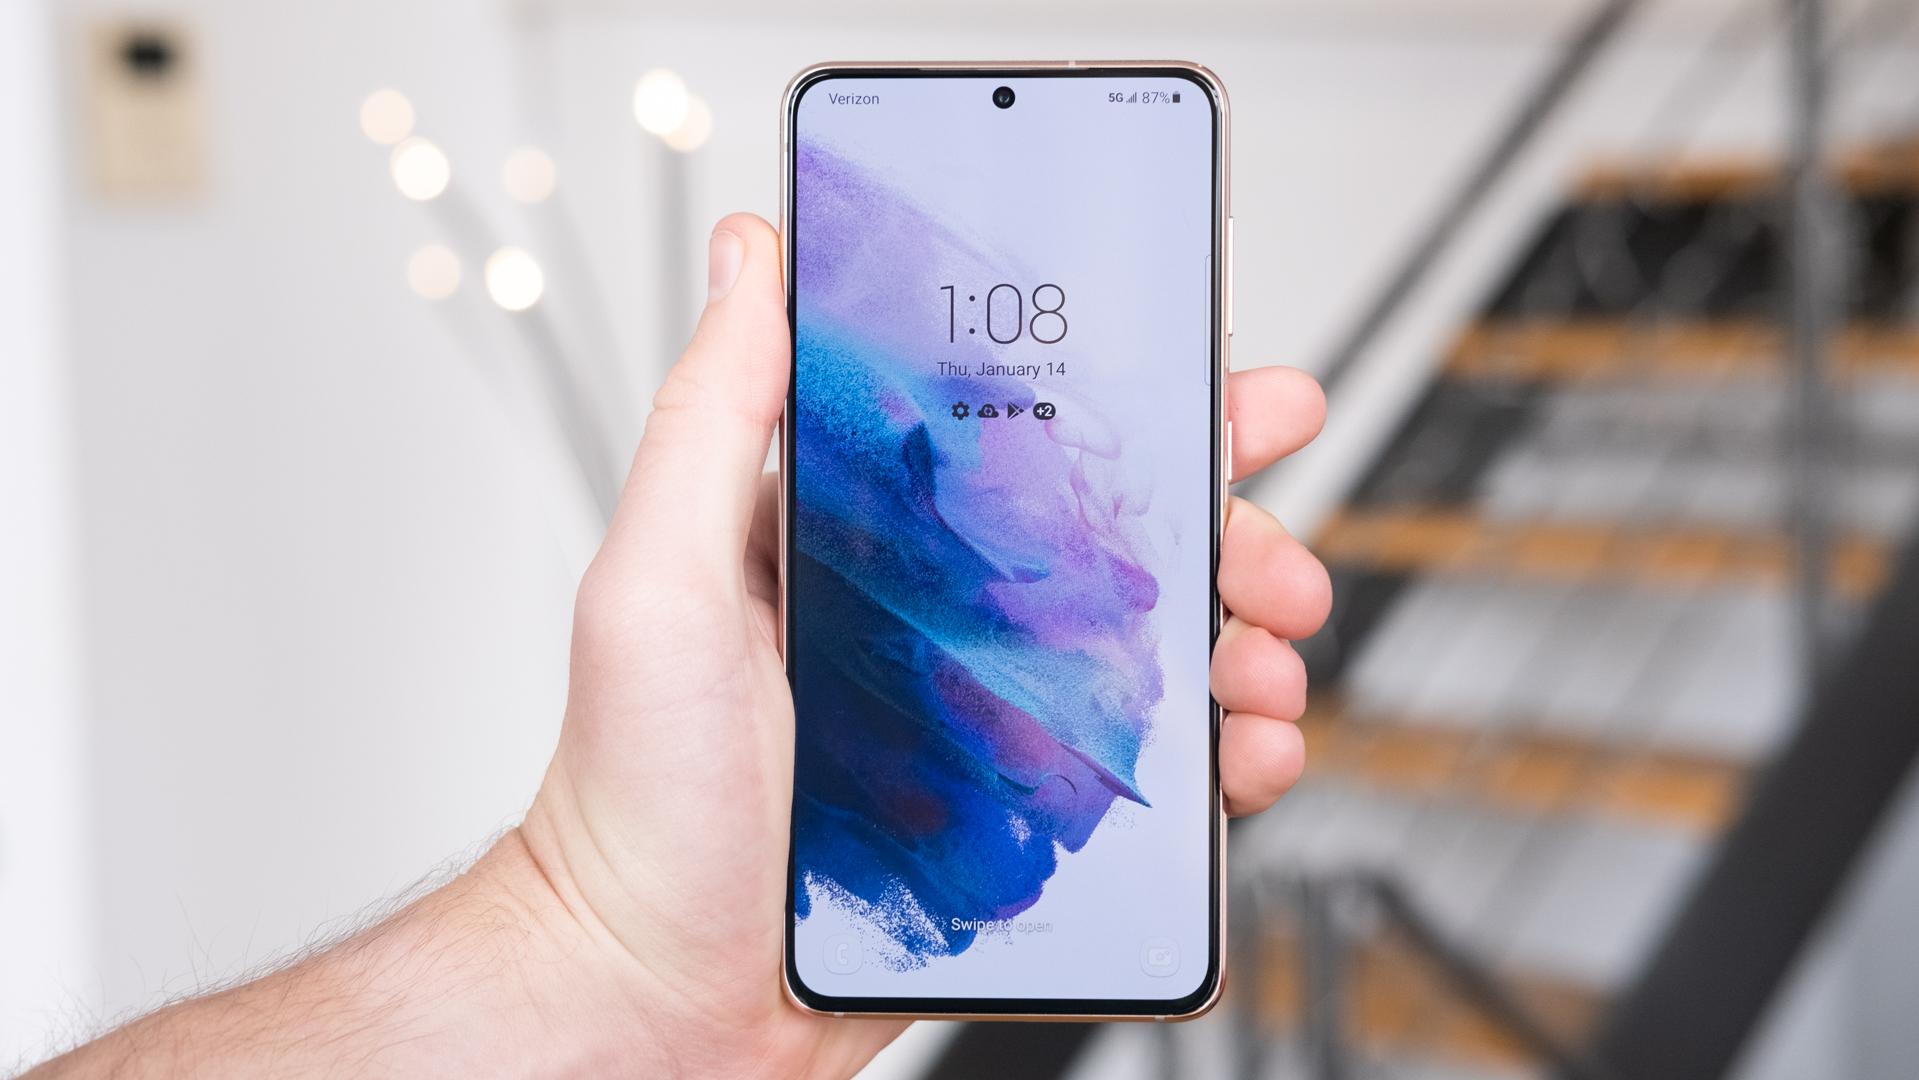 Samsung Galaxy S21 display in hand 2